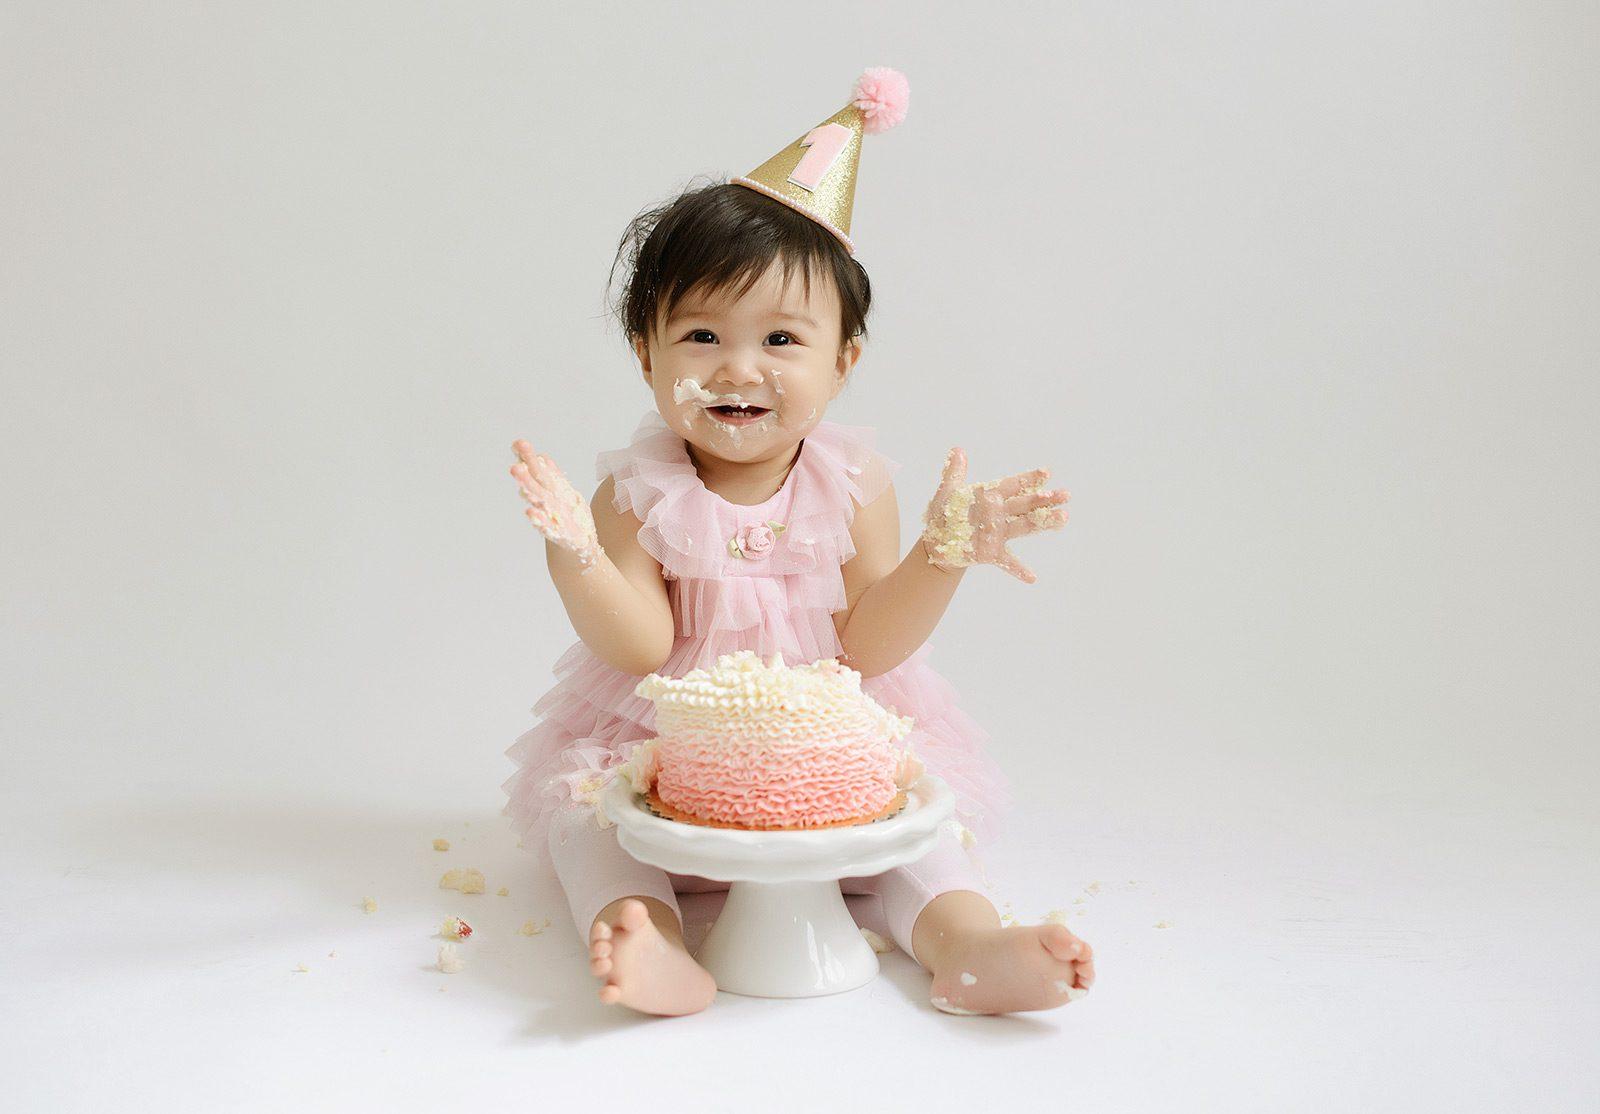 cake-06